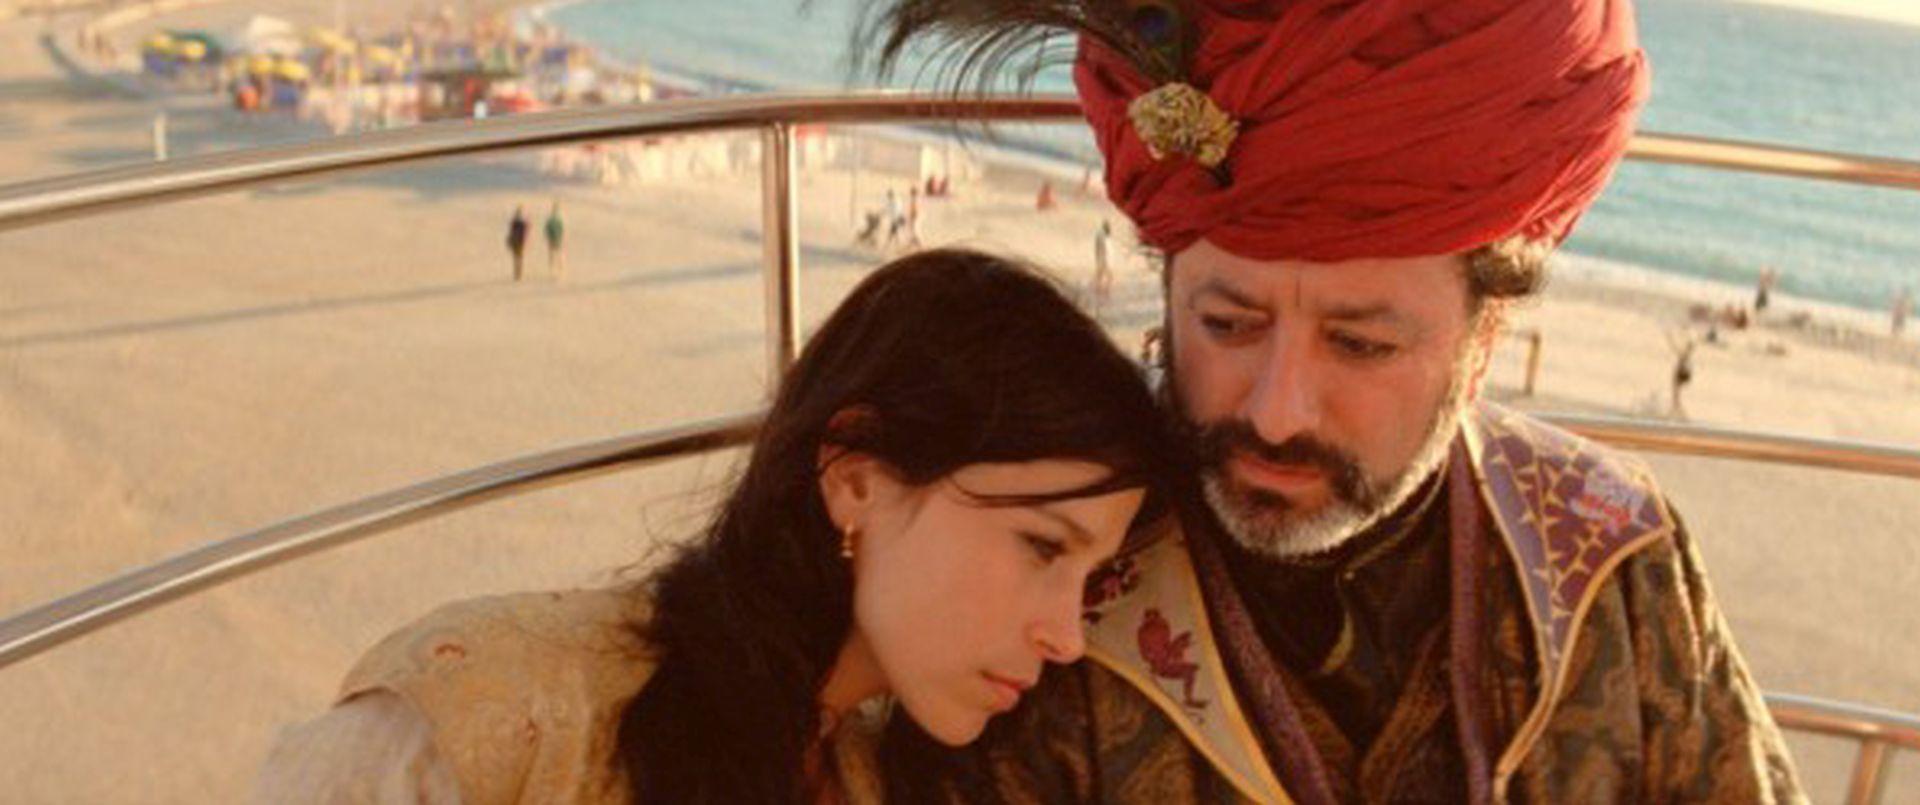 HUMAN RIGHTS FILM FESTIVAL: Tri od dvadeset najboljih filmova Sight&Sounda besplatno